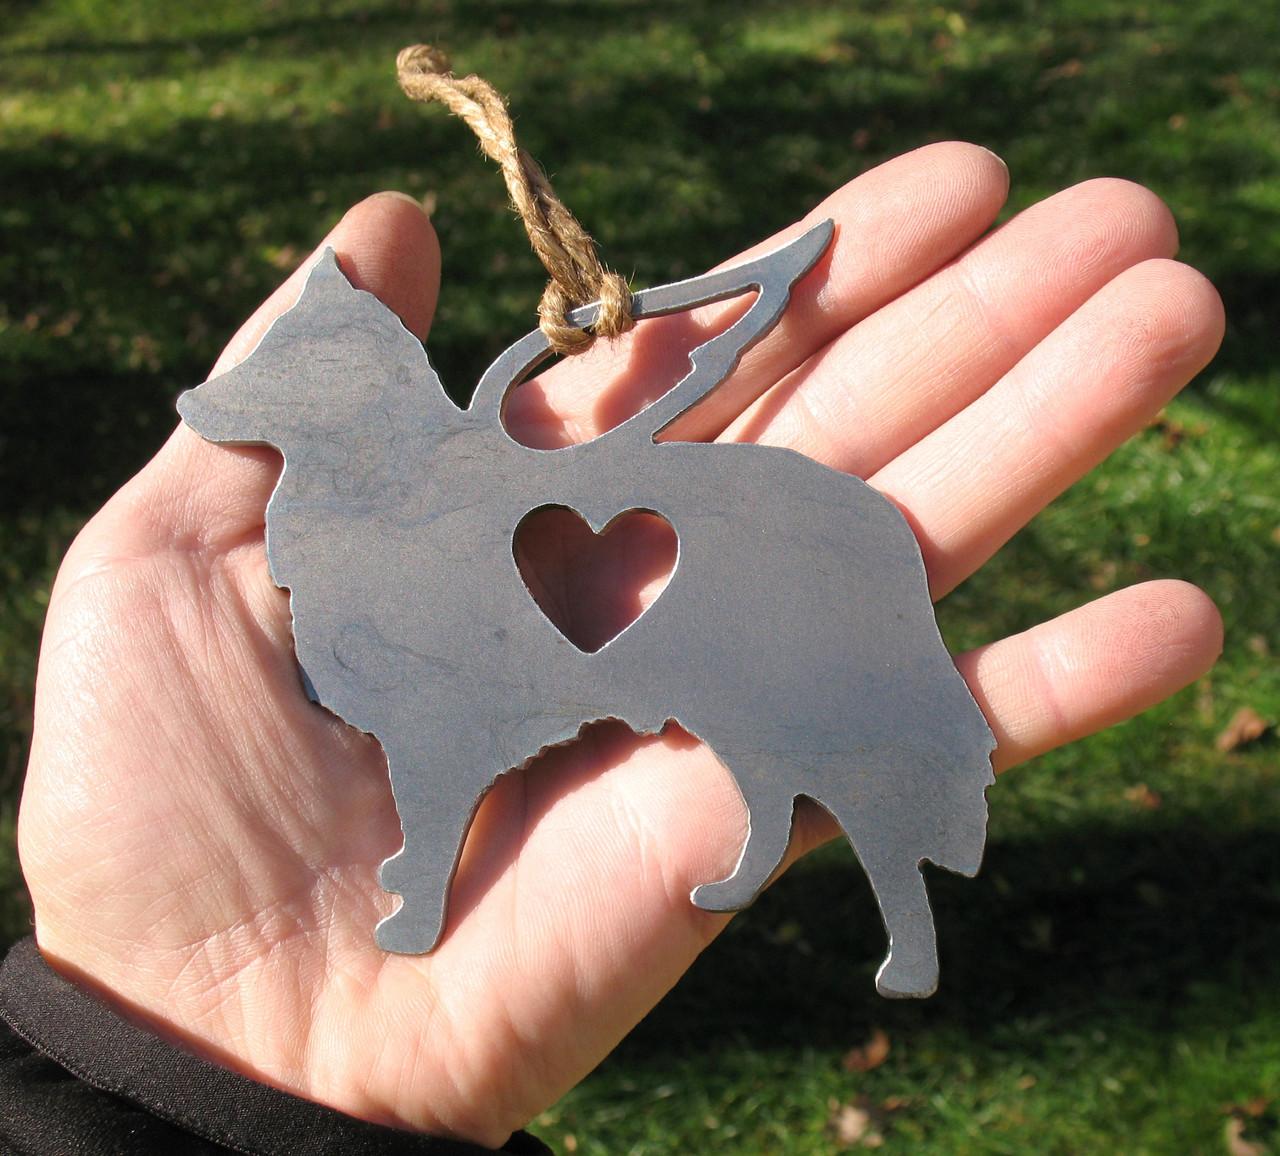 Shetland Sheepdog 2 Pet Loss Gift Ornament Angel - Pet Memorial - Dog Sympathy Remembrance Gift - Metal Dog Christmas Ornament